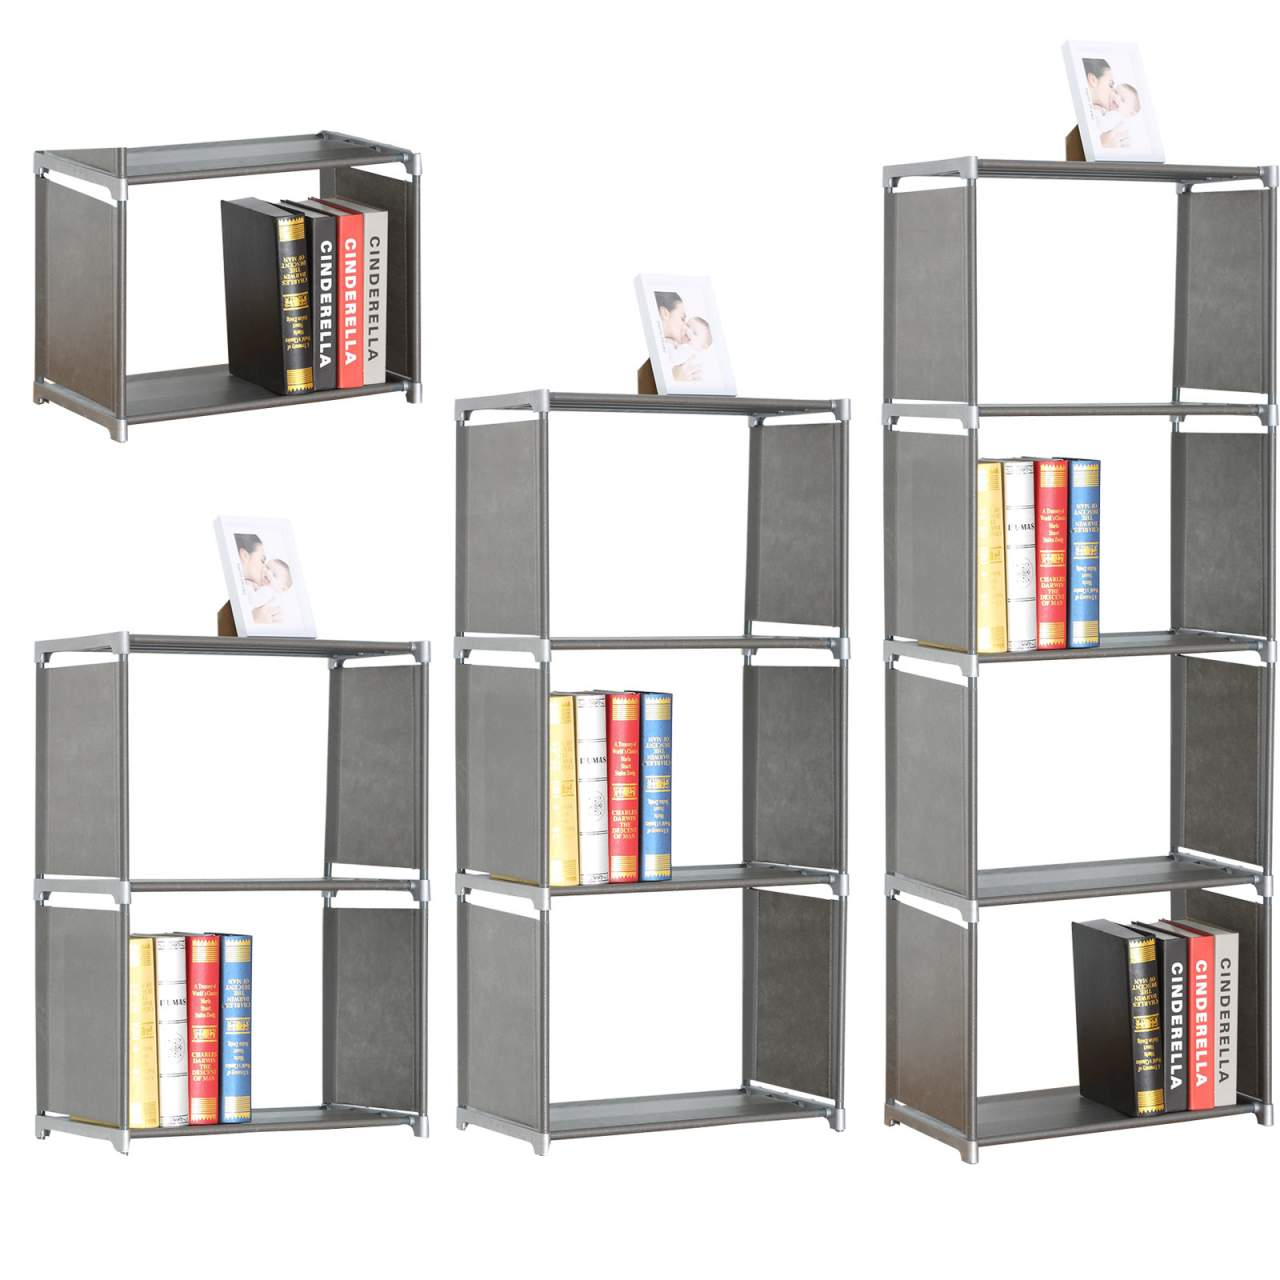 woltu rgb9267sb lagerregal standregal aufbewahrungregal regale f r b cher 3 ebenen mehr raum. Black Bedroom Furniture Sets. Home Design Ideas